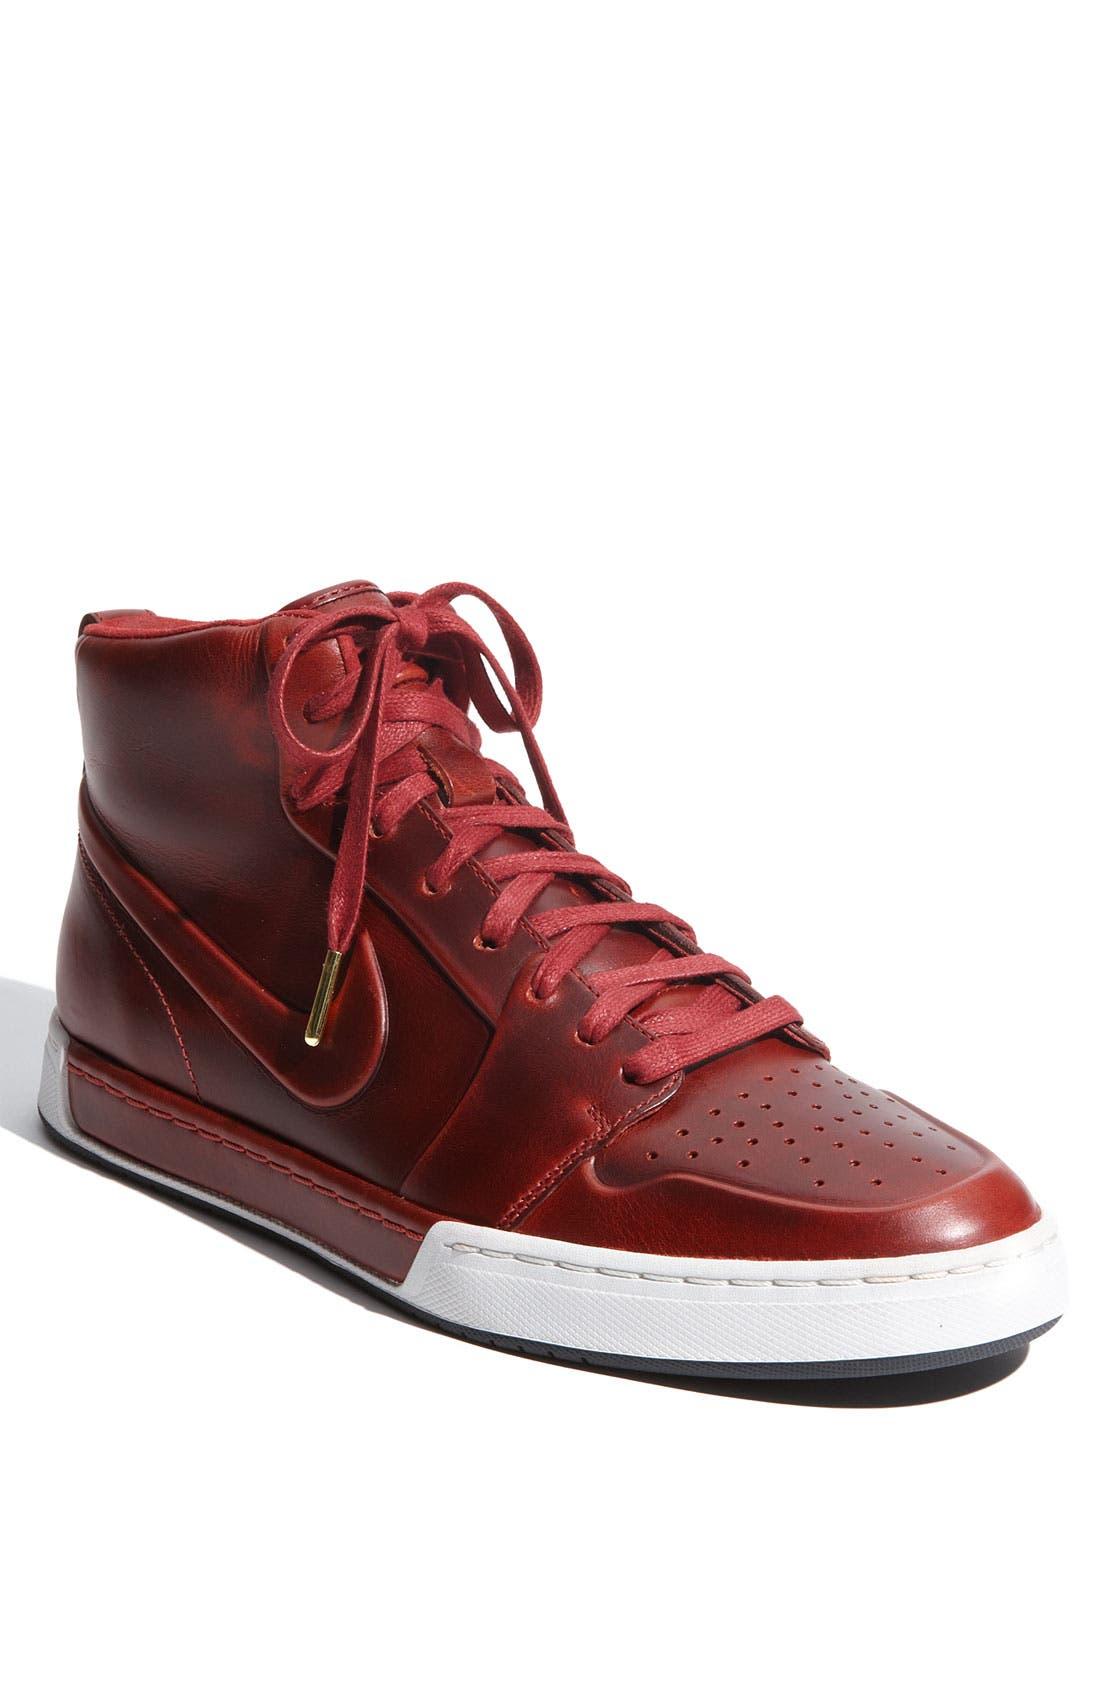 Alternate Image 1 Selected - Nike 'Air Royal Mid VT' Sneaker